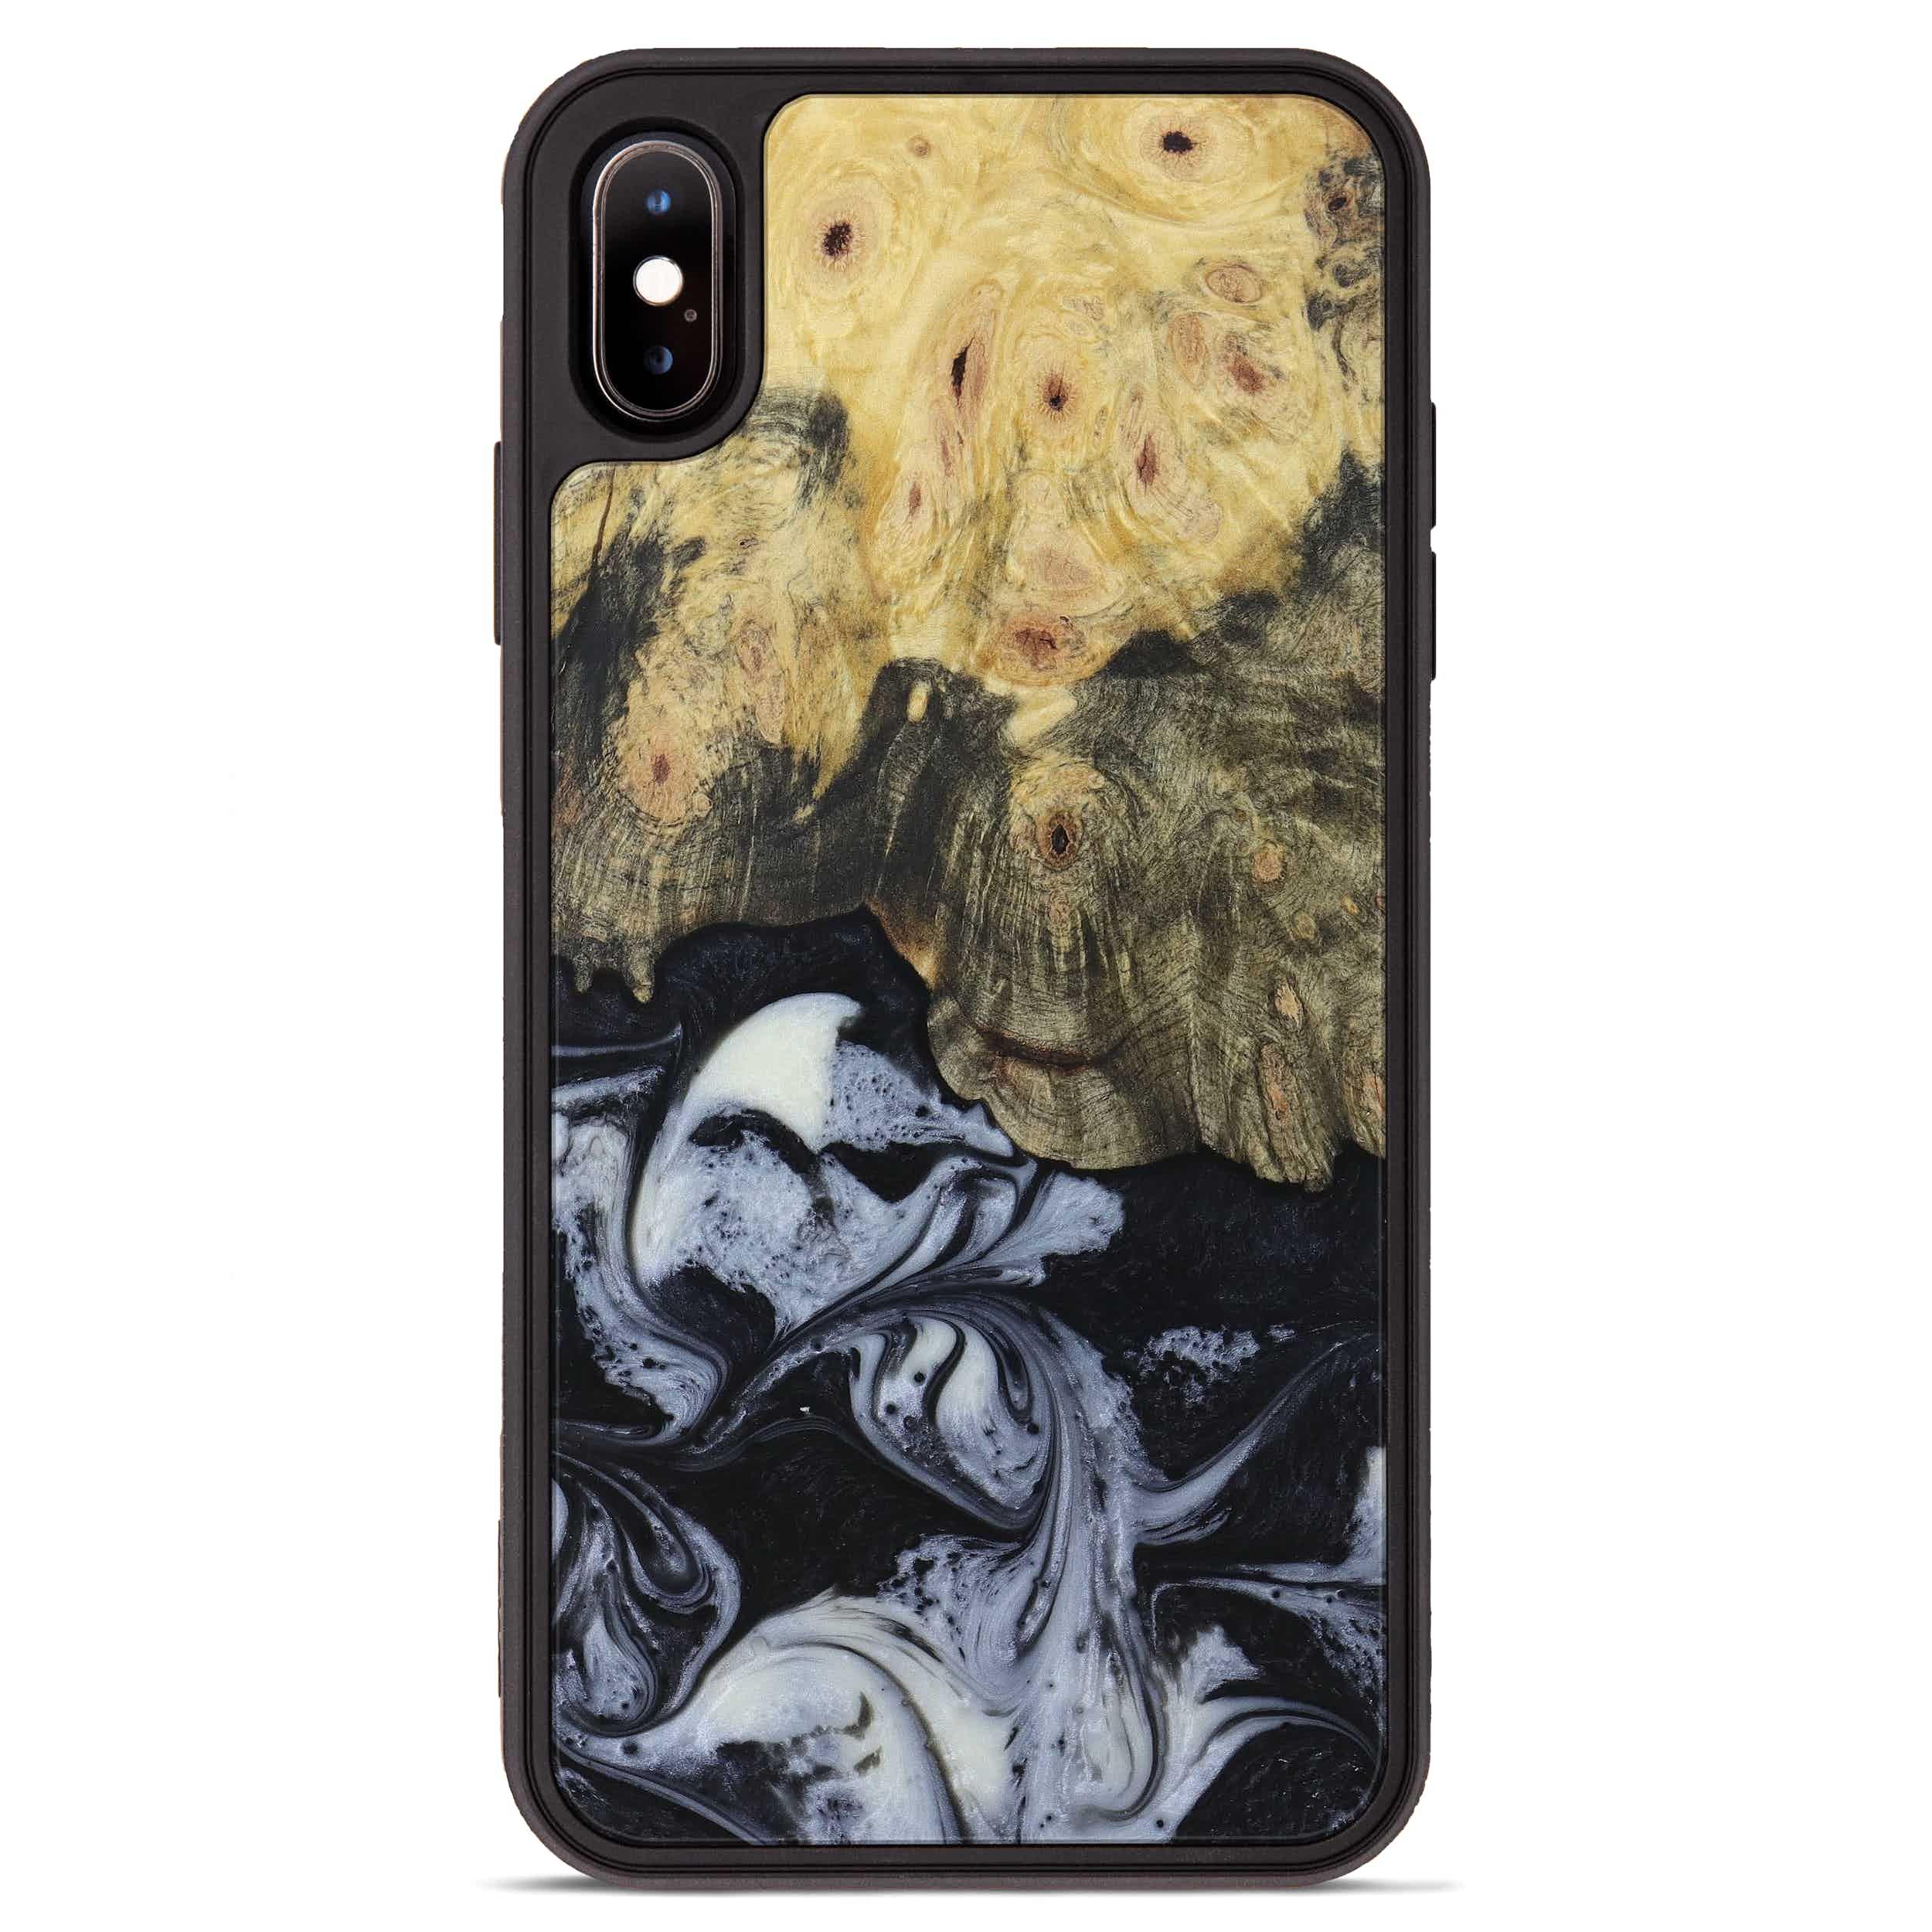 iPhone Xs Max Wood+Resin Phone Case - Rosalinda (Black & White, 397919)